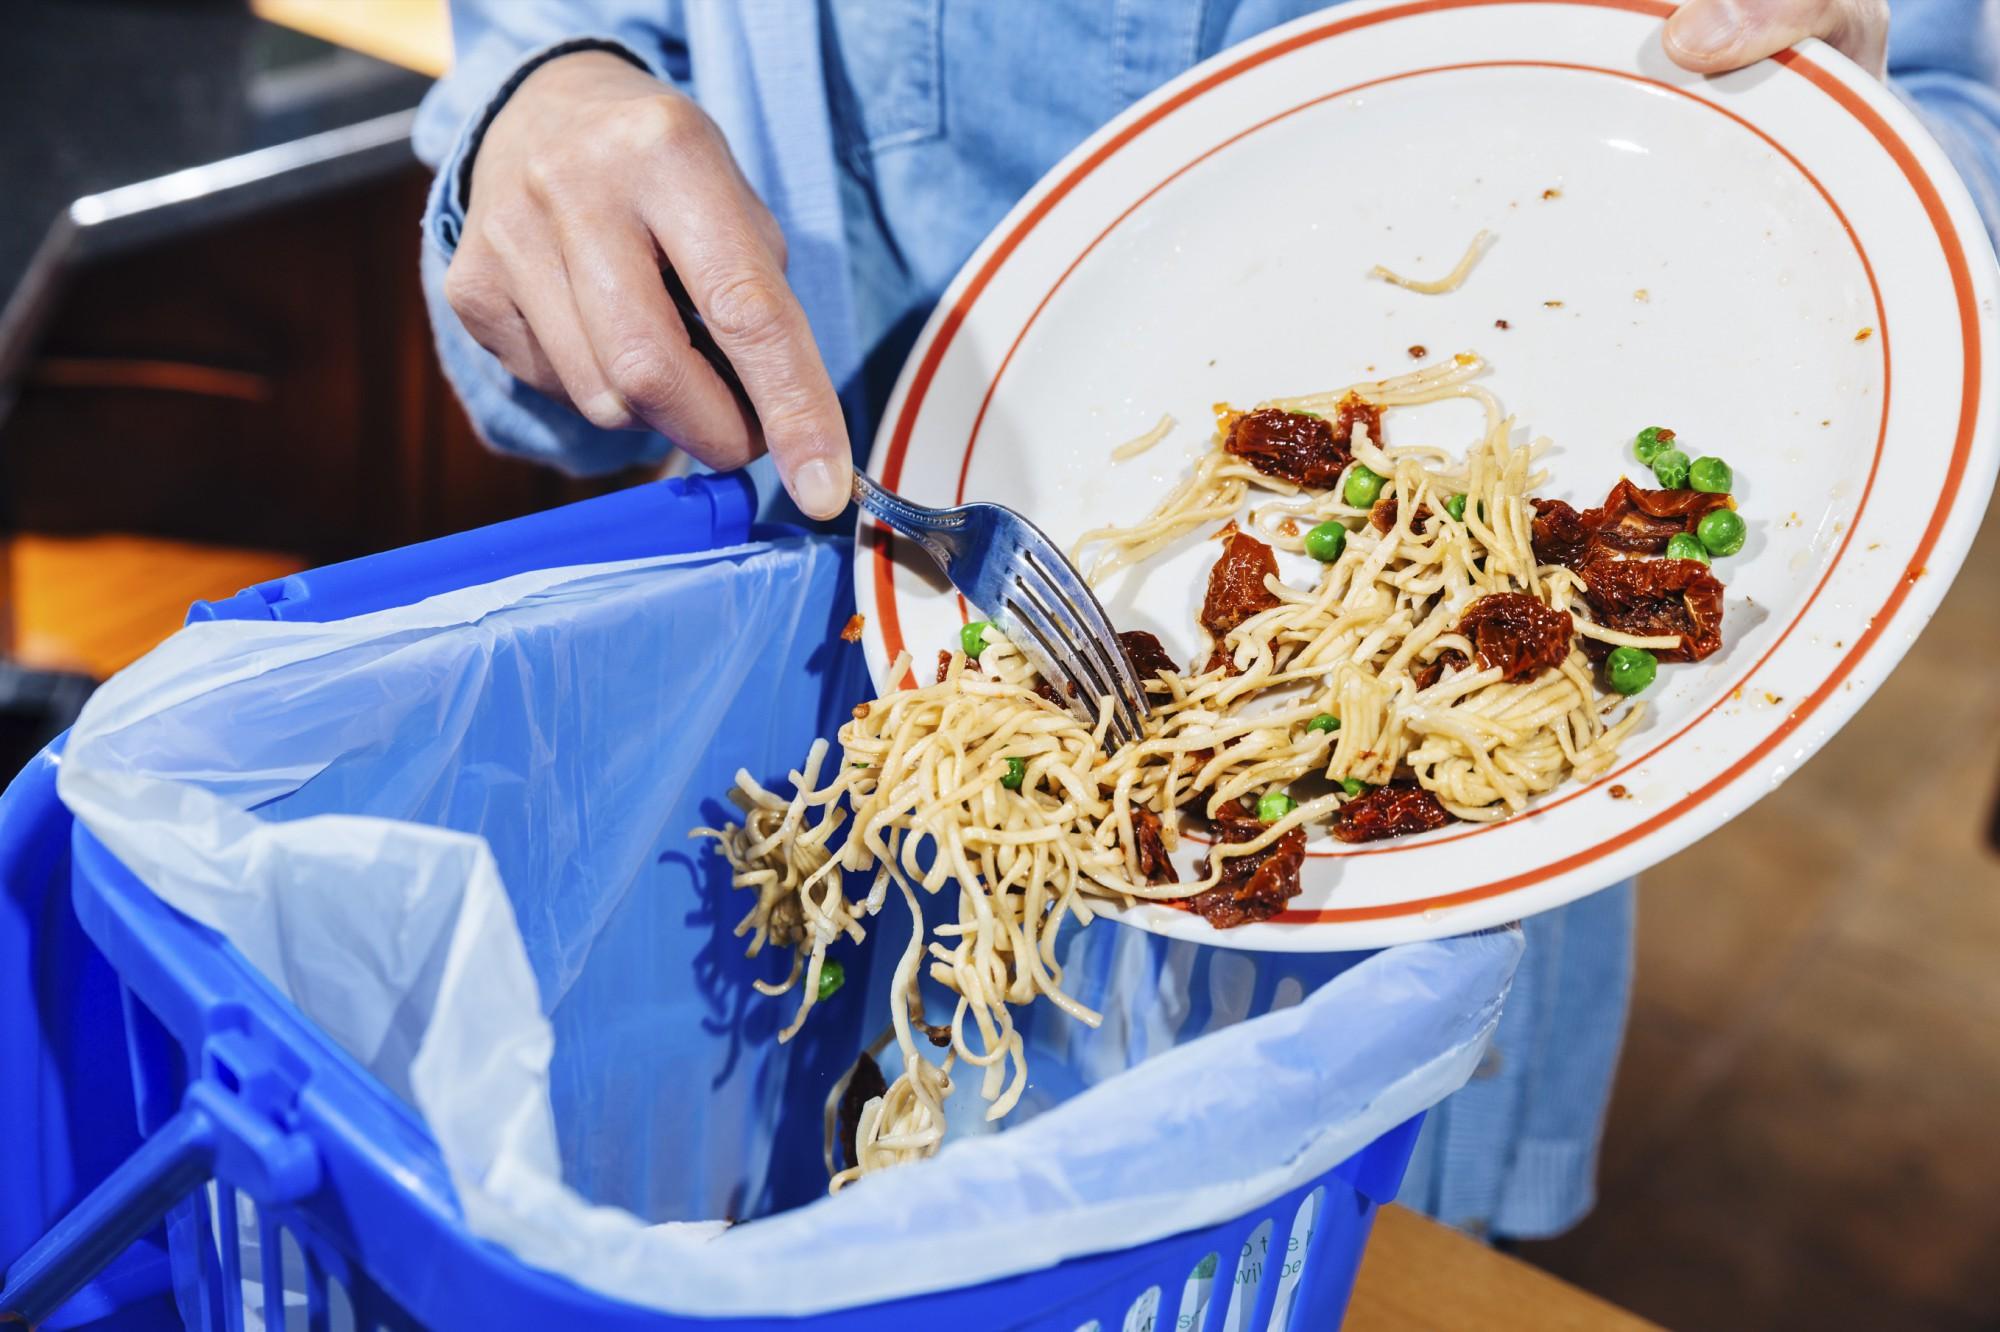 Food Waste Management Photo